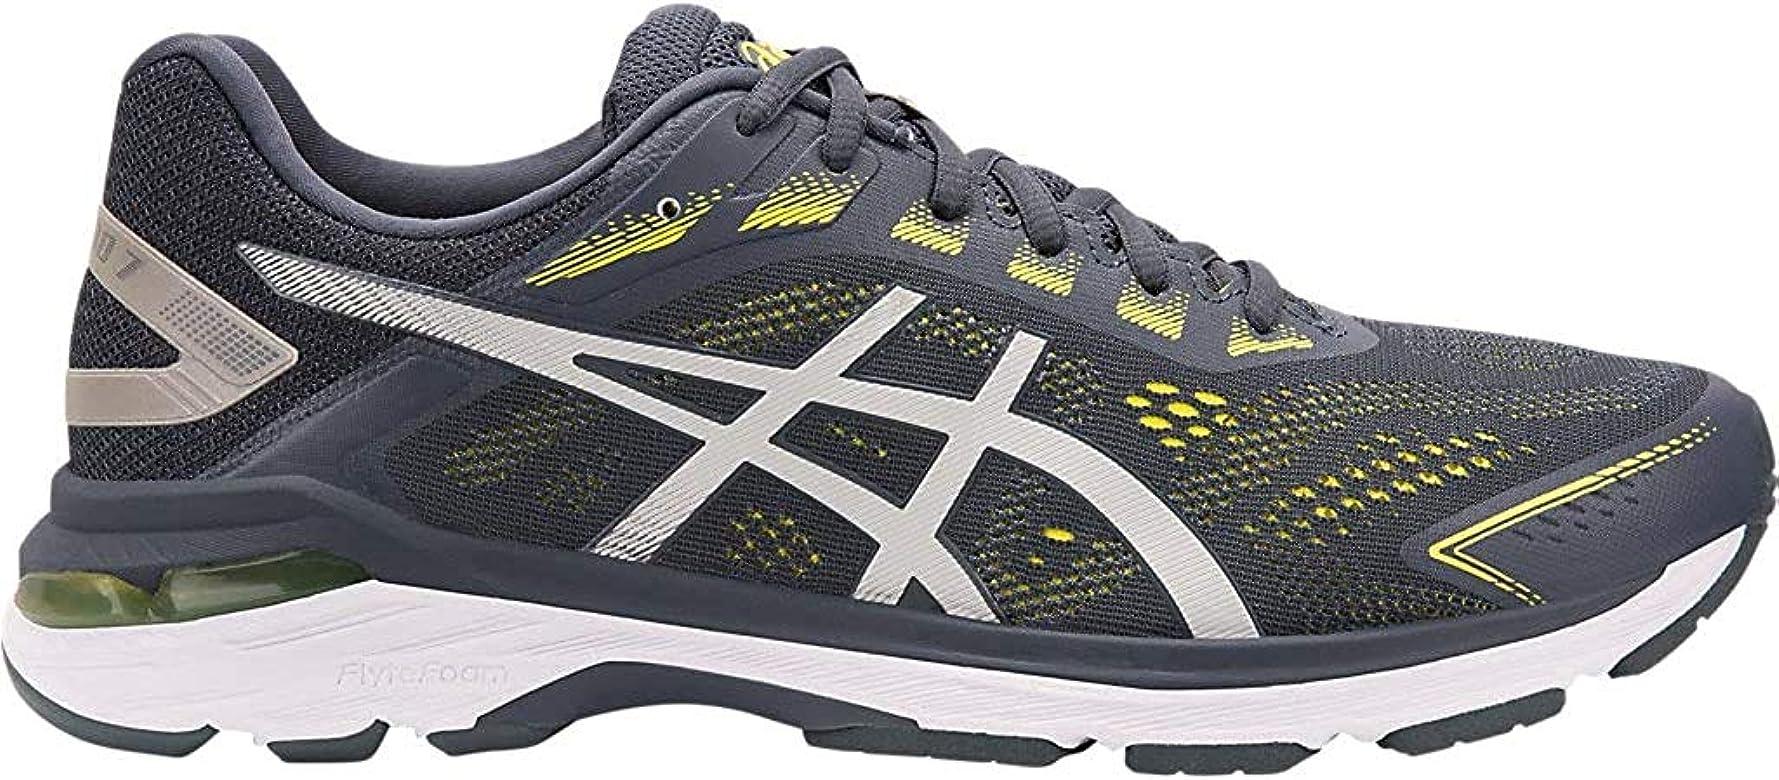 Asics GT-2000 7 - Zapatillas de correr para hombre, Gris (Chispa de Tarmac/Limón), 41 EU: Amazon.es: Zapatos y complementos